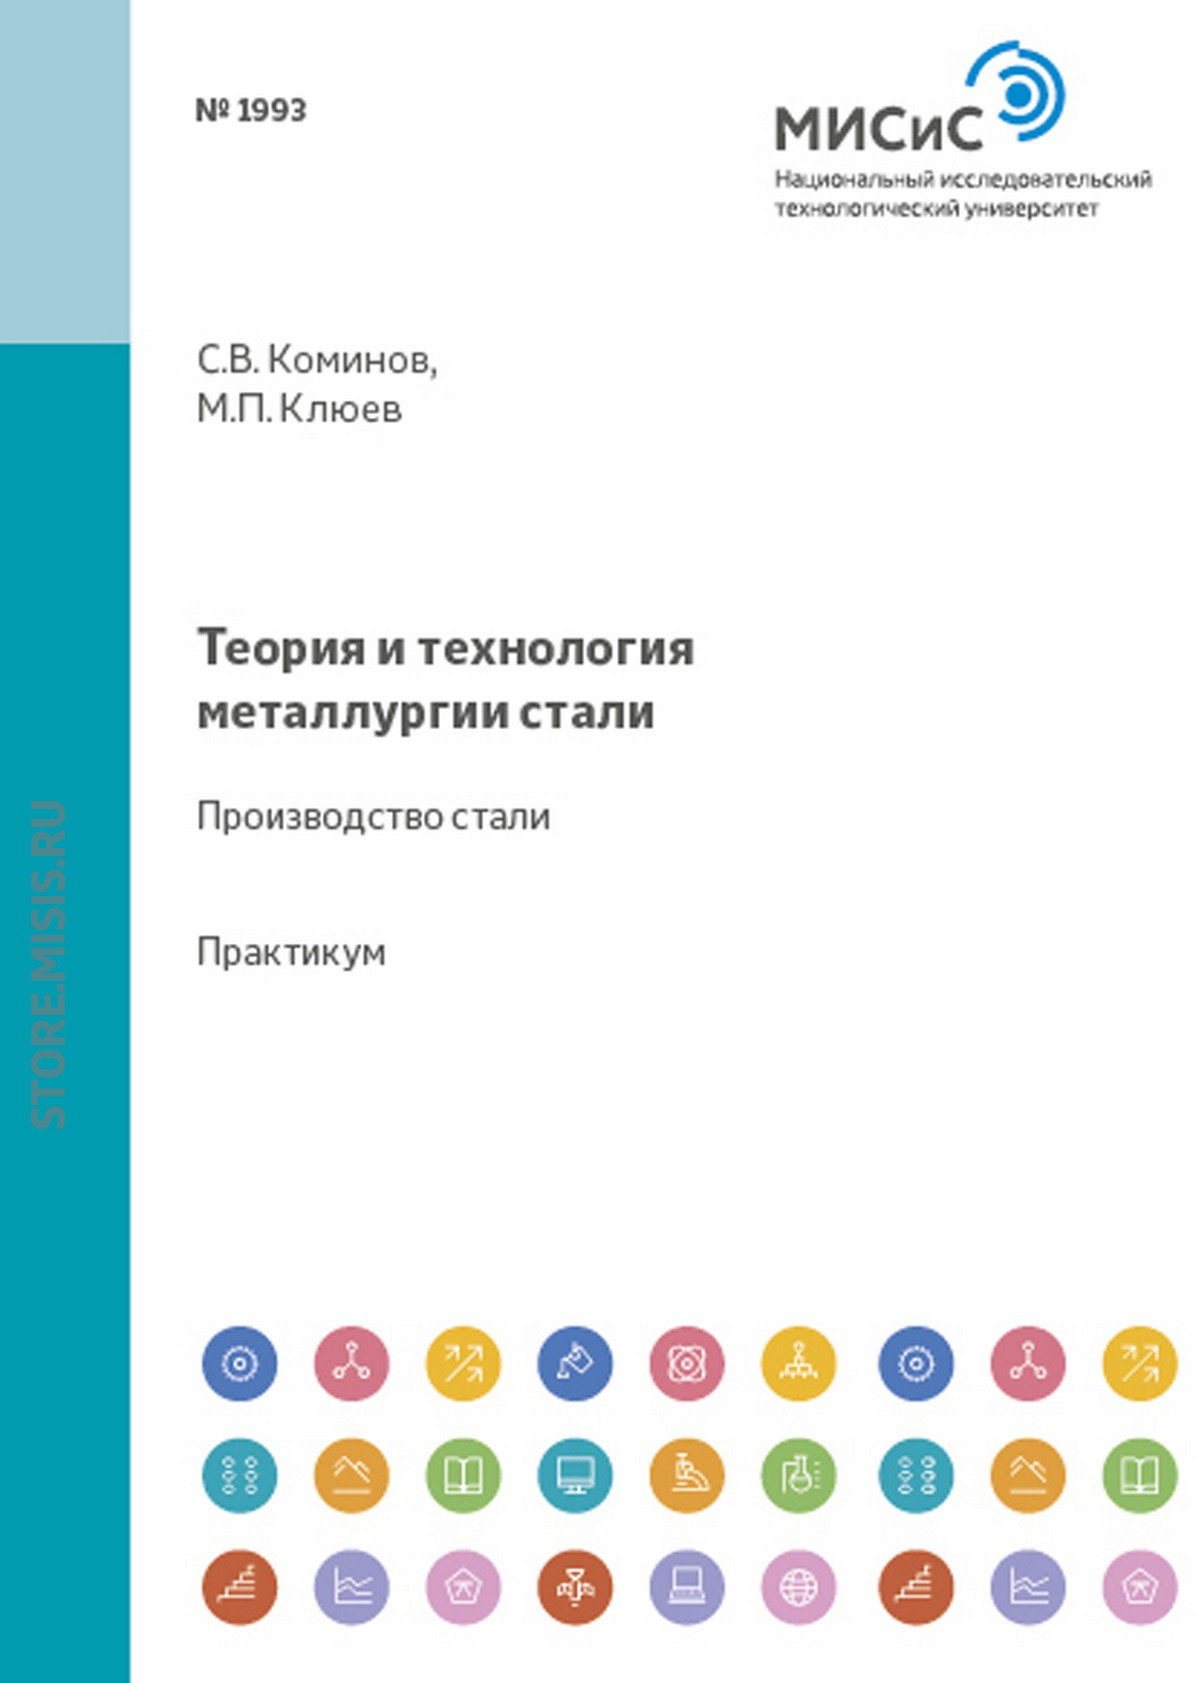 Сергей Коминов Теория и технология металлургии стали. Производство стали